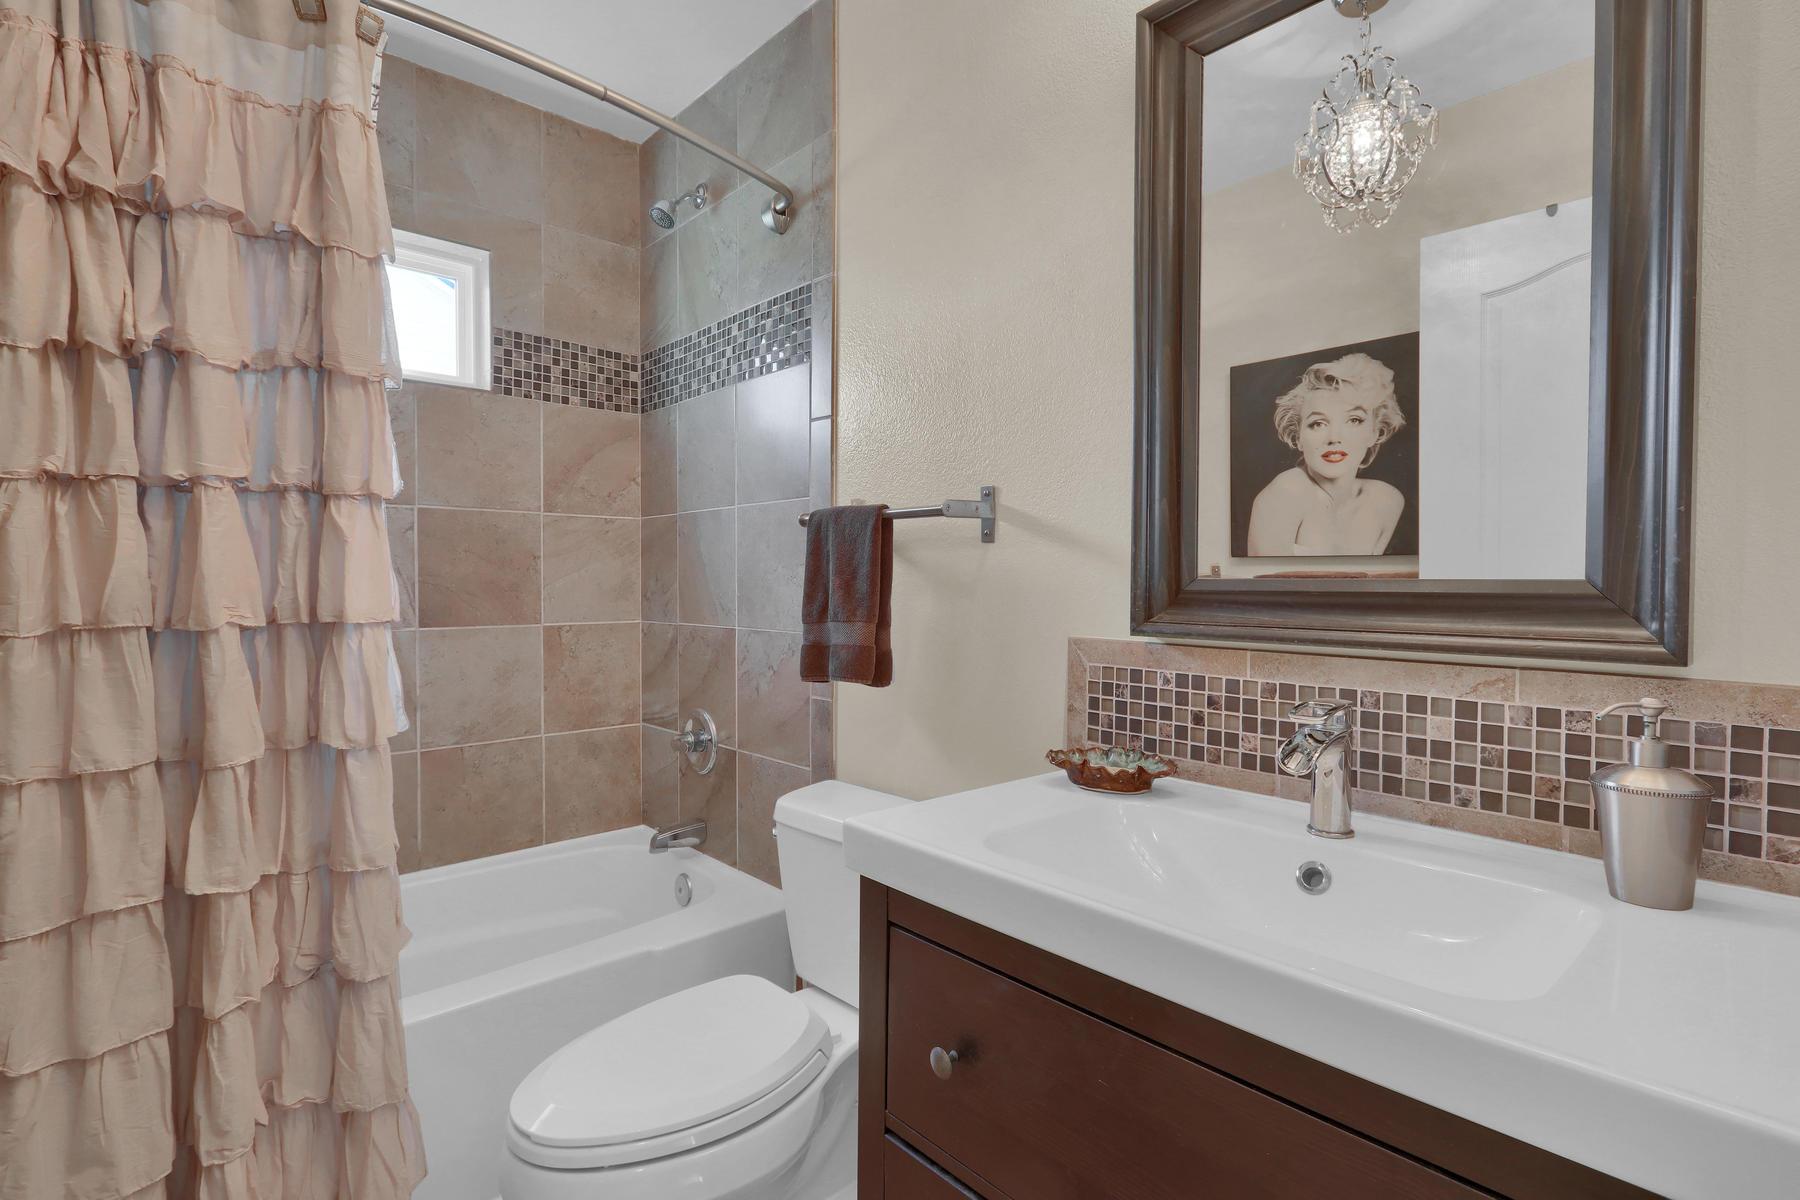 5370 S Genoa St Cenntenial CO-020-30-Bathroom-MLS_Size.jpg